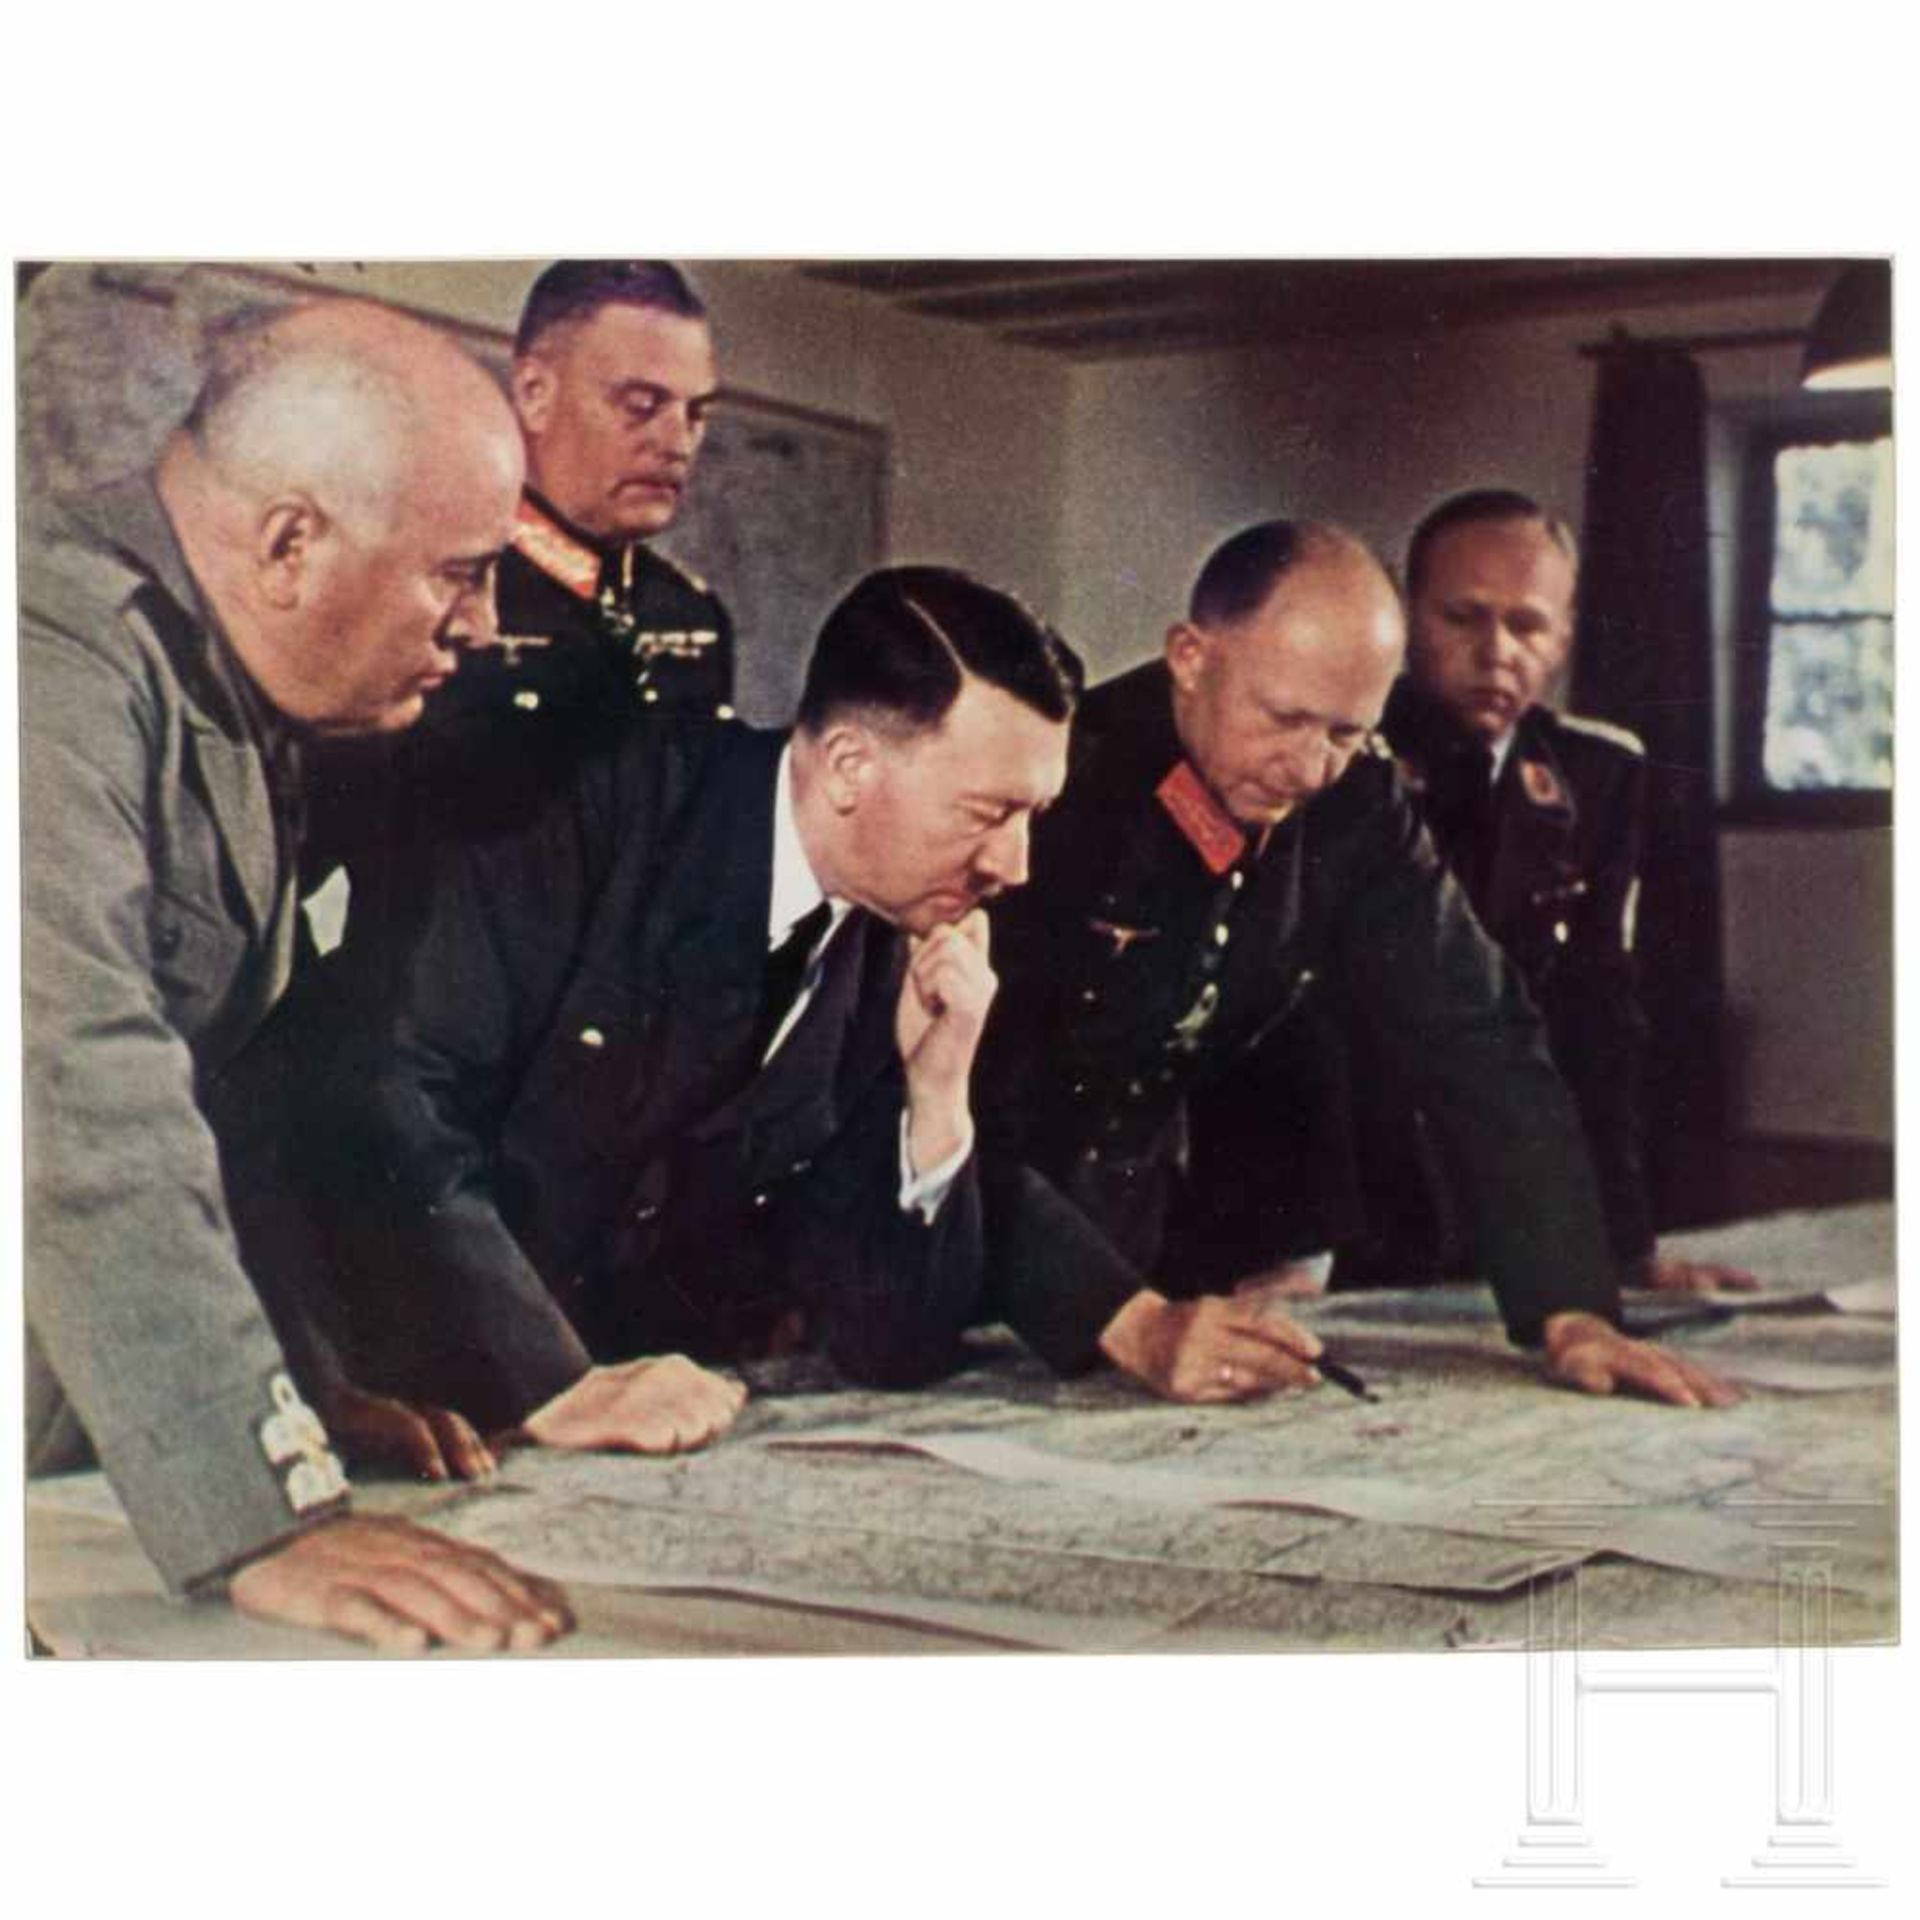 Los 6018 - Walter Frentz (1907 - 2004) - Farbfoto aus dem Führerhauptquartier 1942Mussolini, Keitel, Hitler,